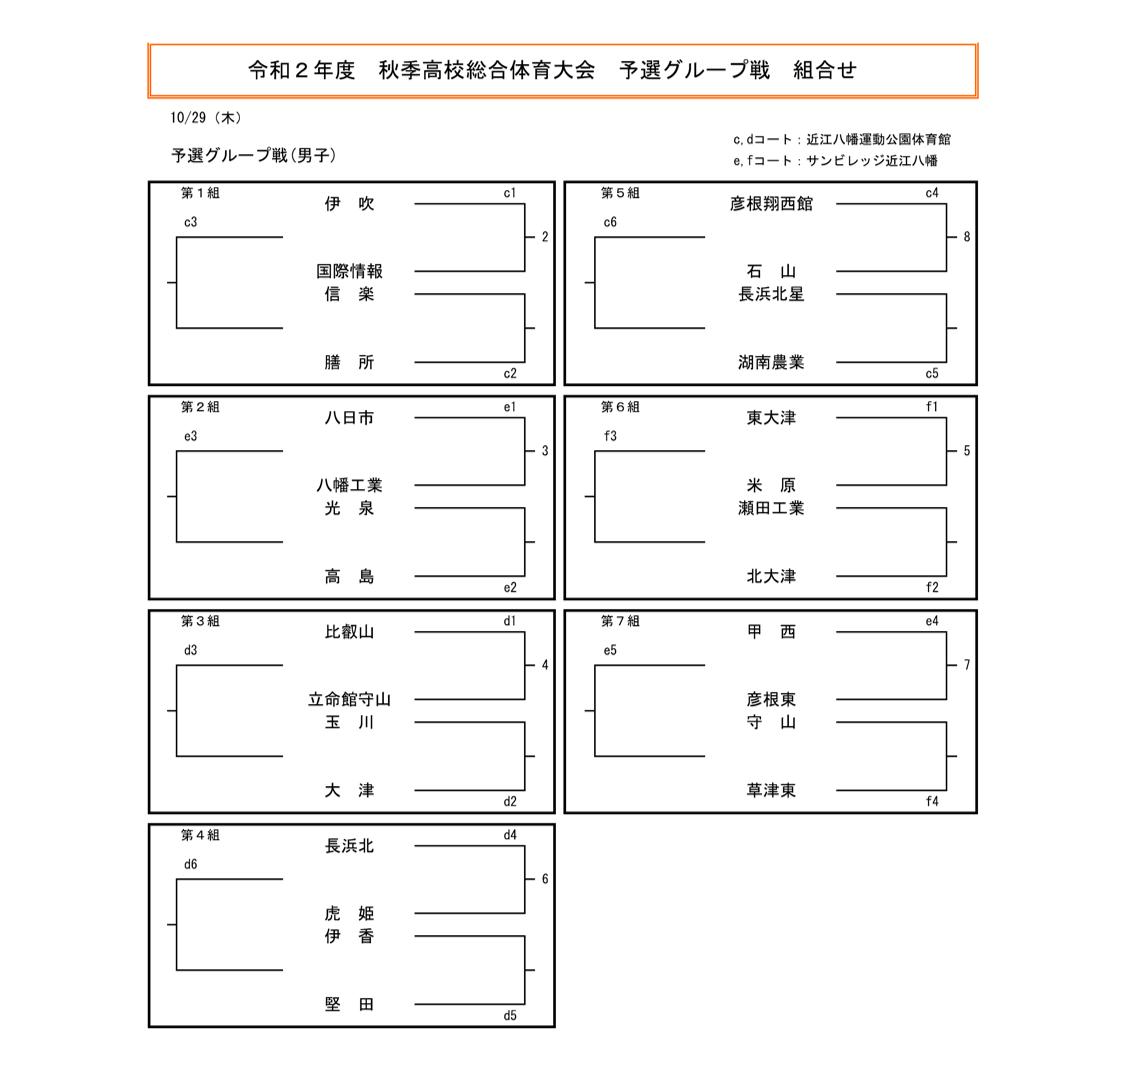 2020年度_全日本高校選手権_滋賀予選_男子_予選グループ_組合せ